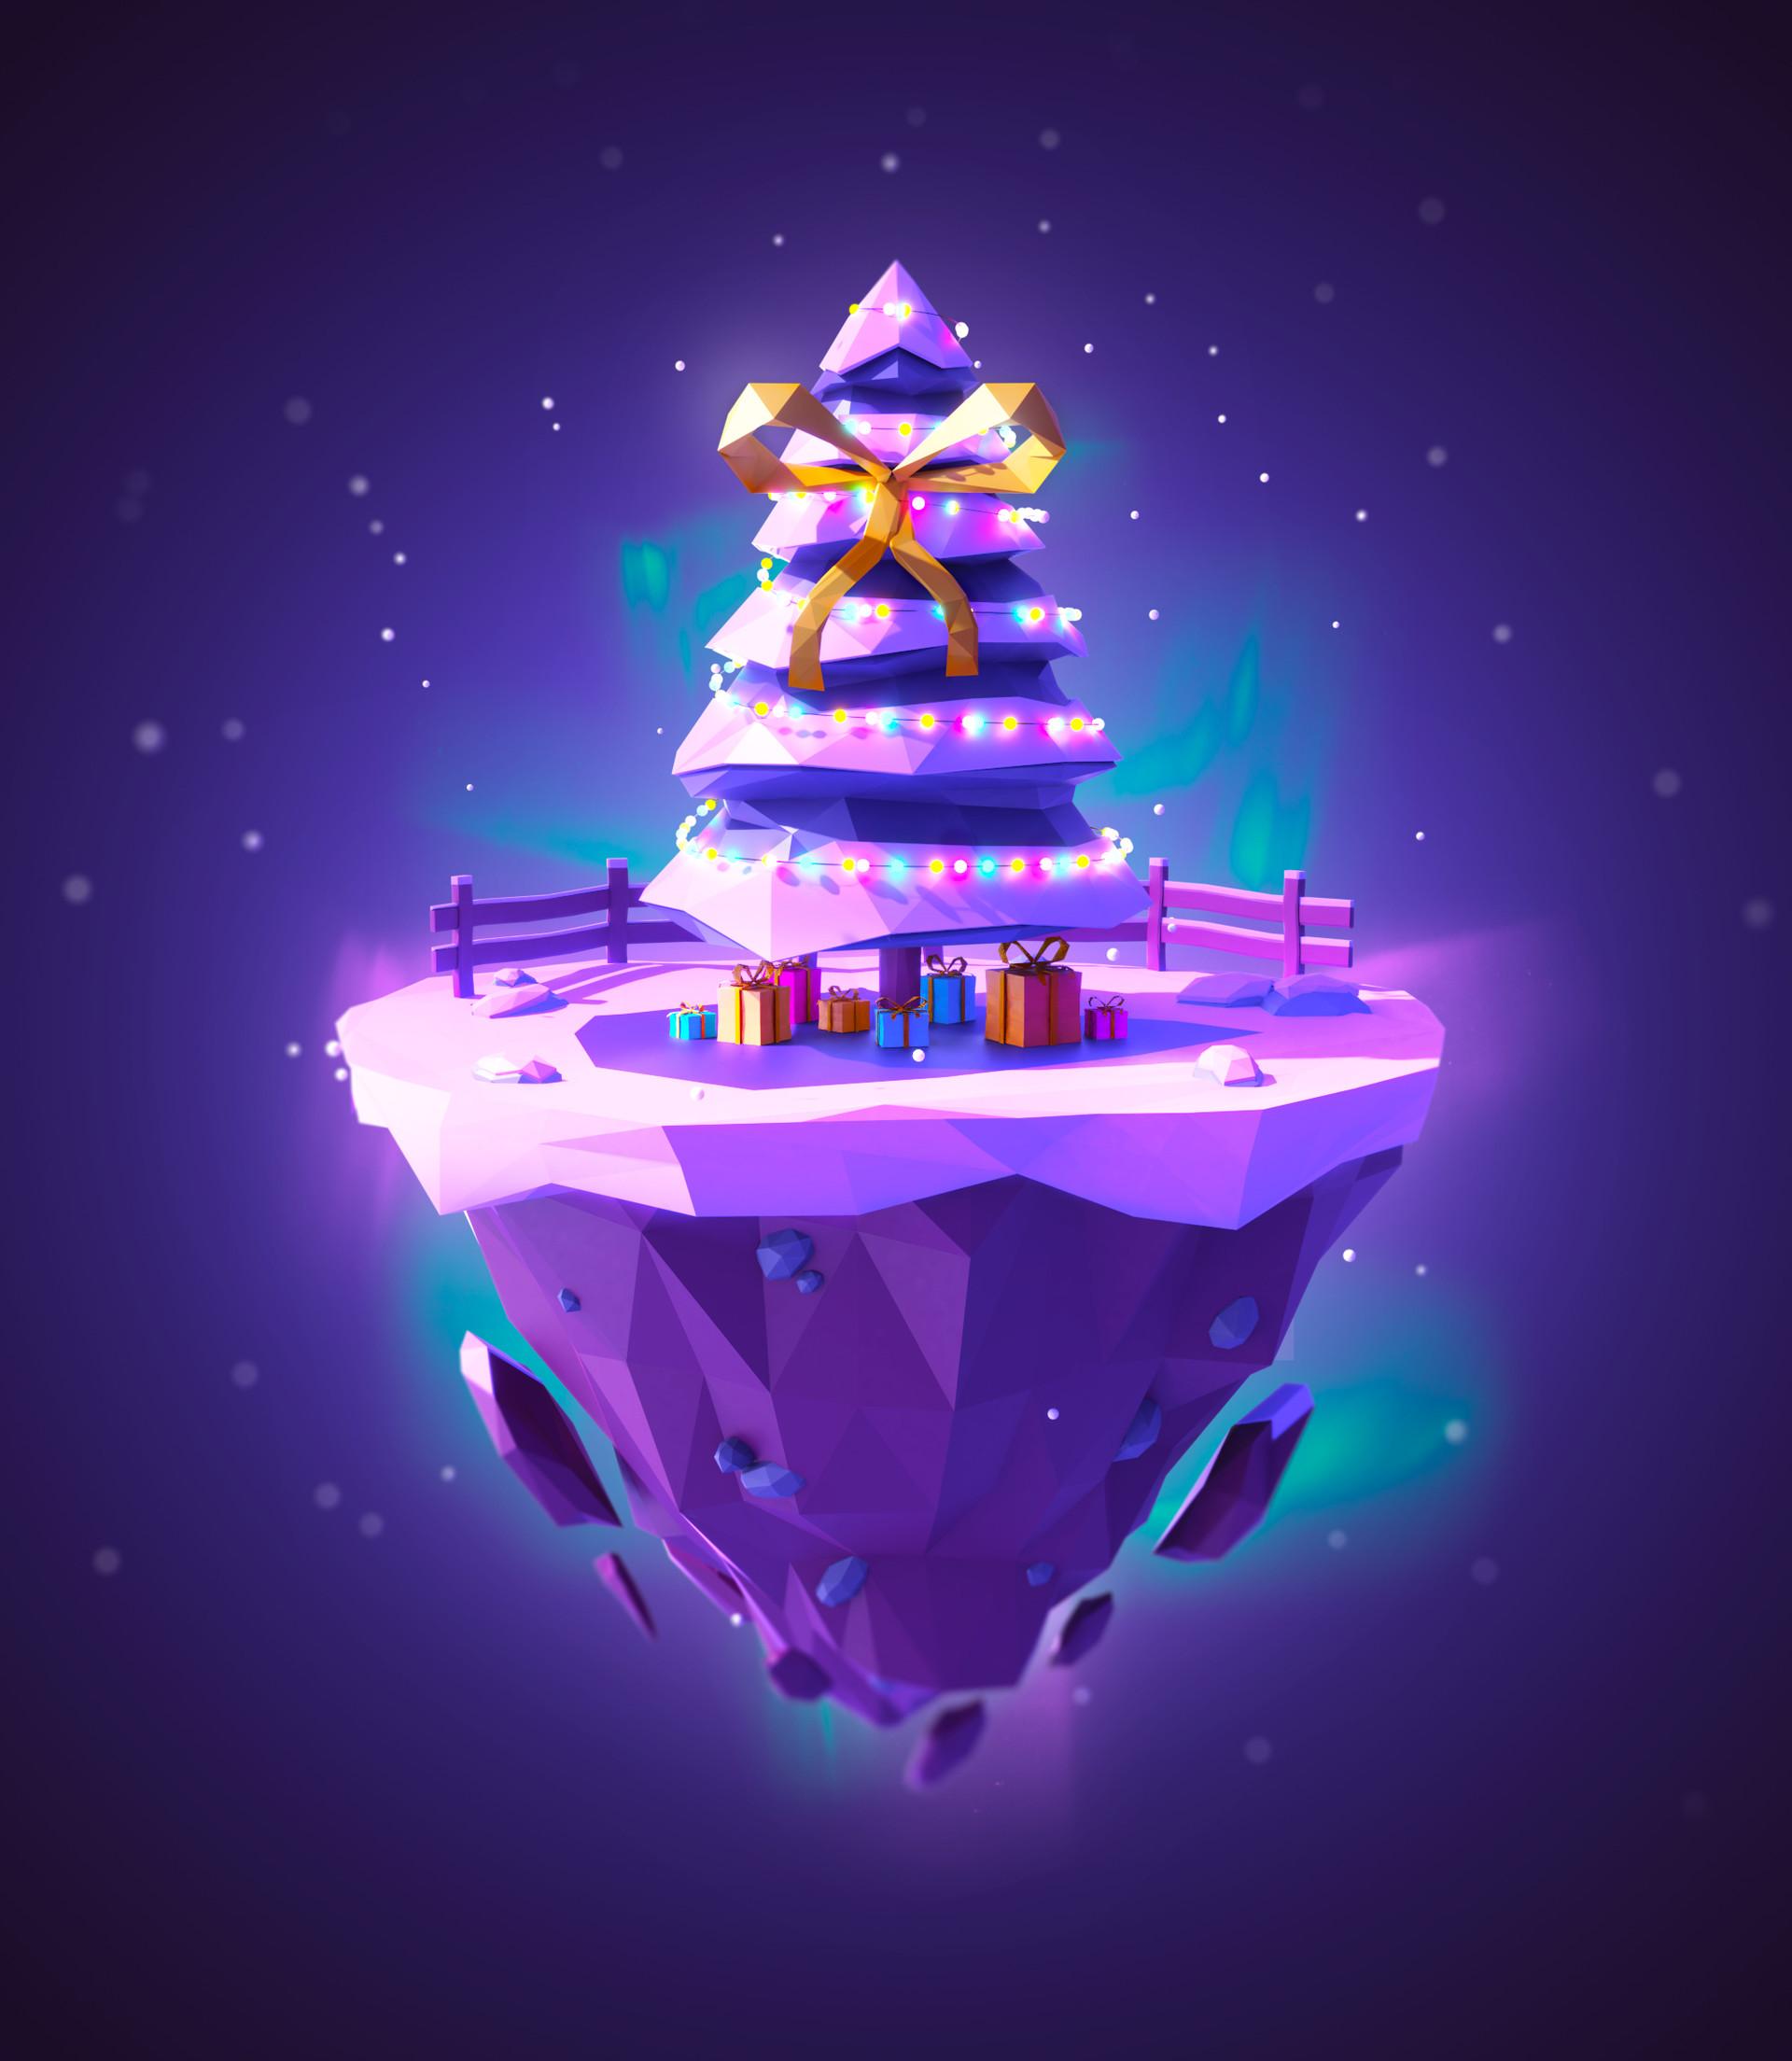 """The Christmas Island"" by Filip Pavelko"